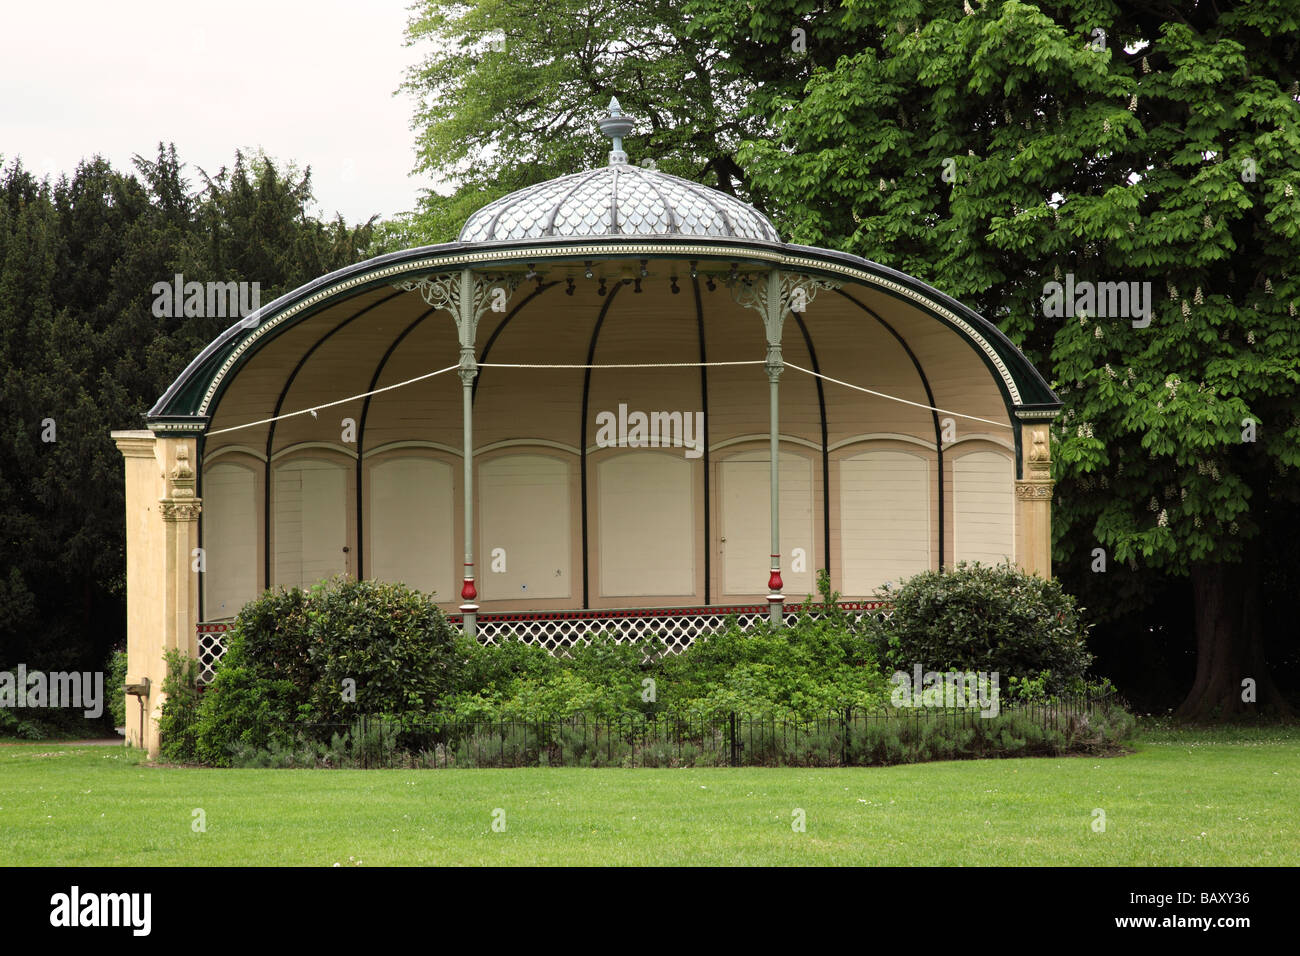 Royal Victoria Park Bandstand, Bath, England Stock Photo